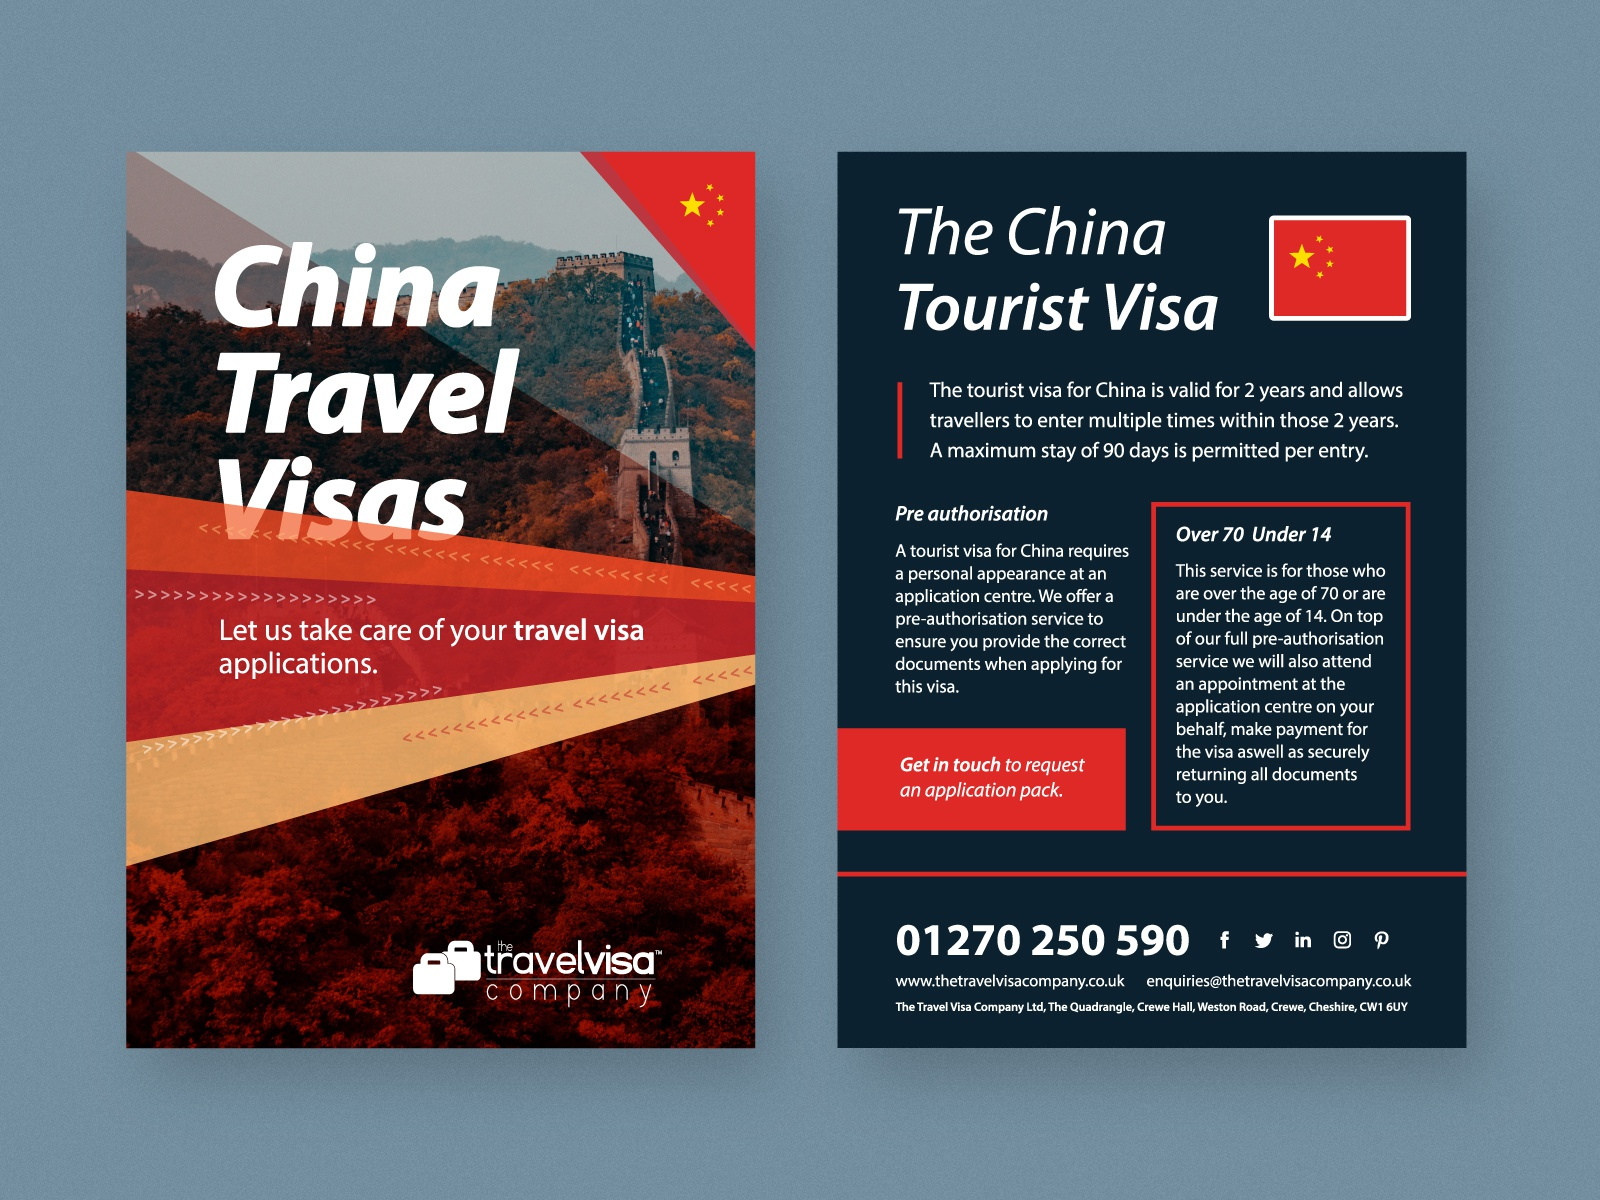 China travel visas